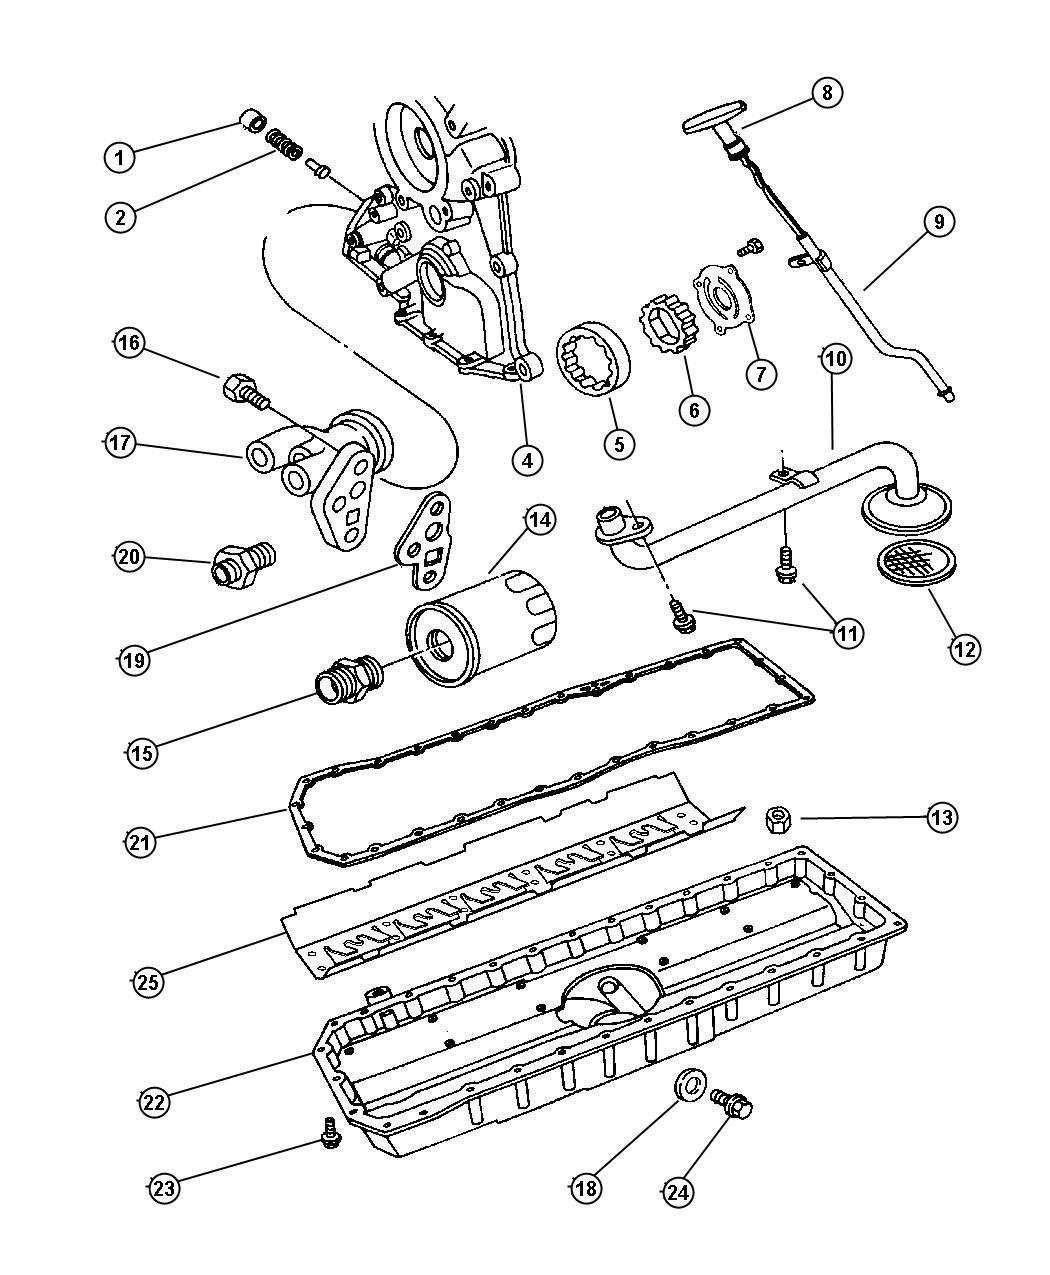 Dodge Viper Engine Oiling 8 0l Engine